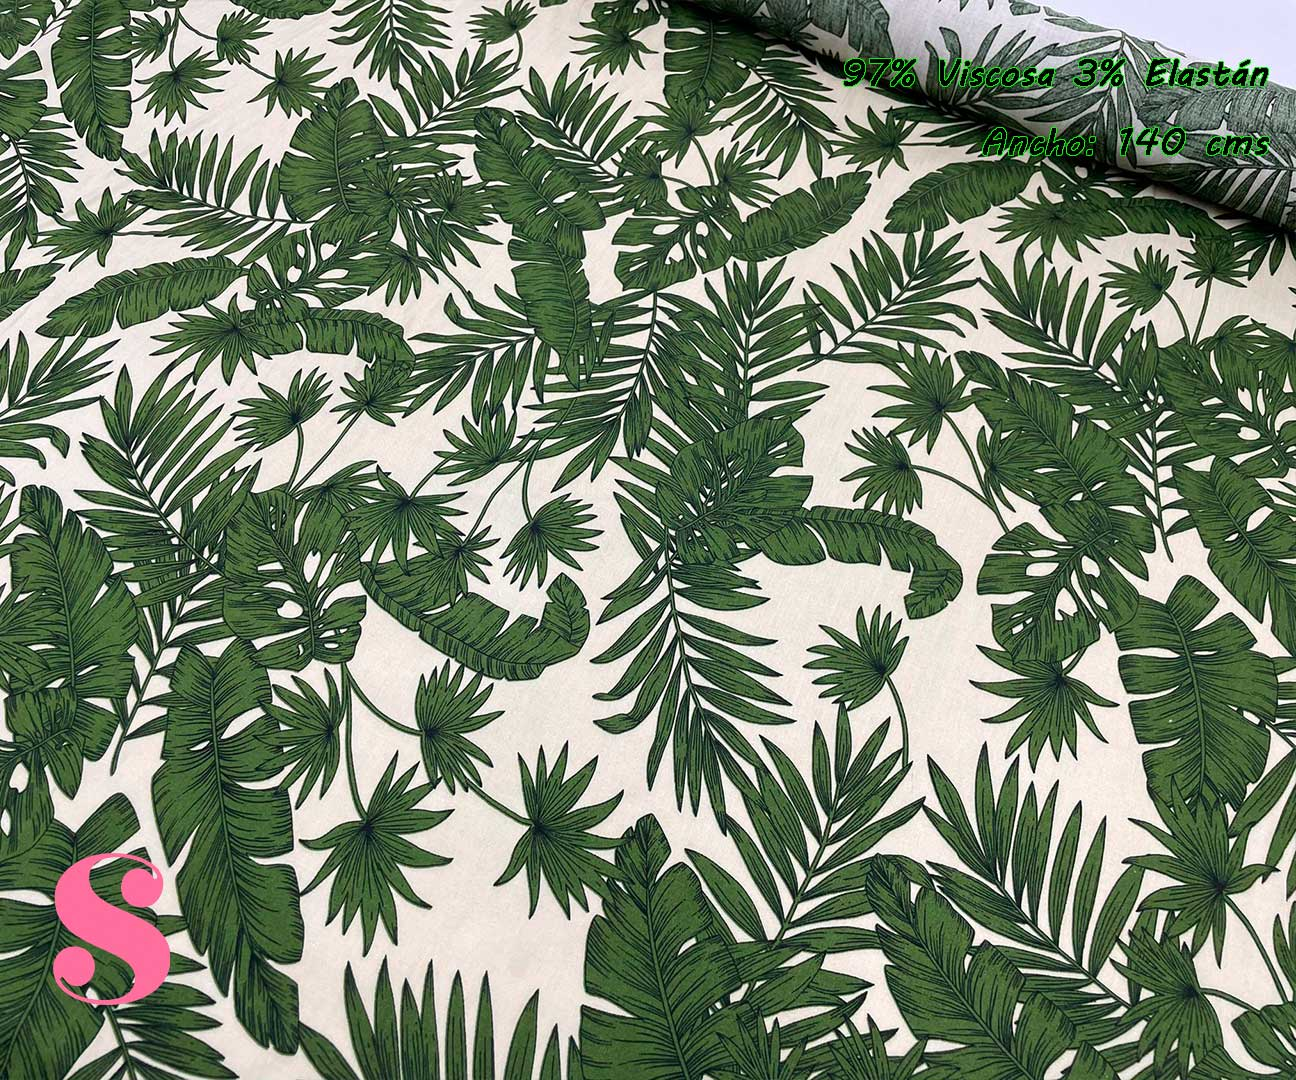 2-telas-de-verano,tejidos-de-verano,tejidos-fresquitos-estampados,telas-fresquitas-estampadas,telas-vaporosas-estampadas,Estampado Viscosa Palmas fondo Verde